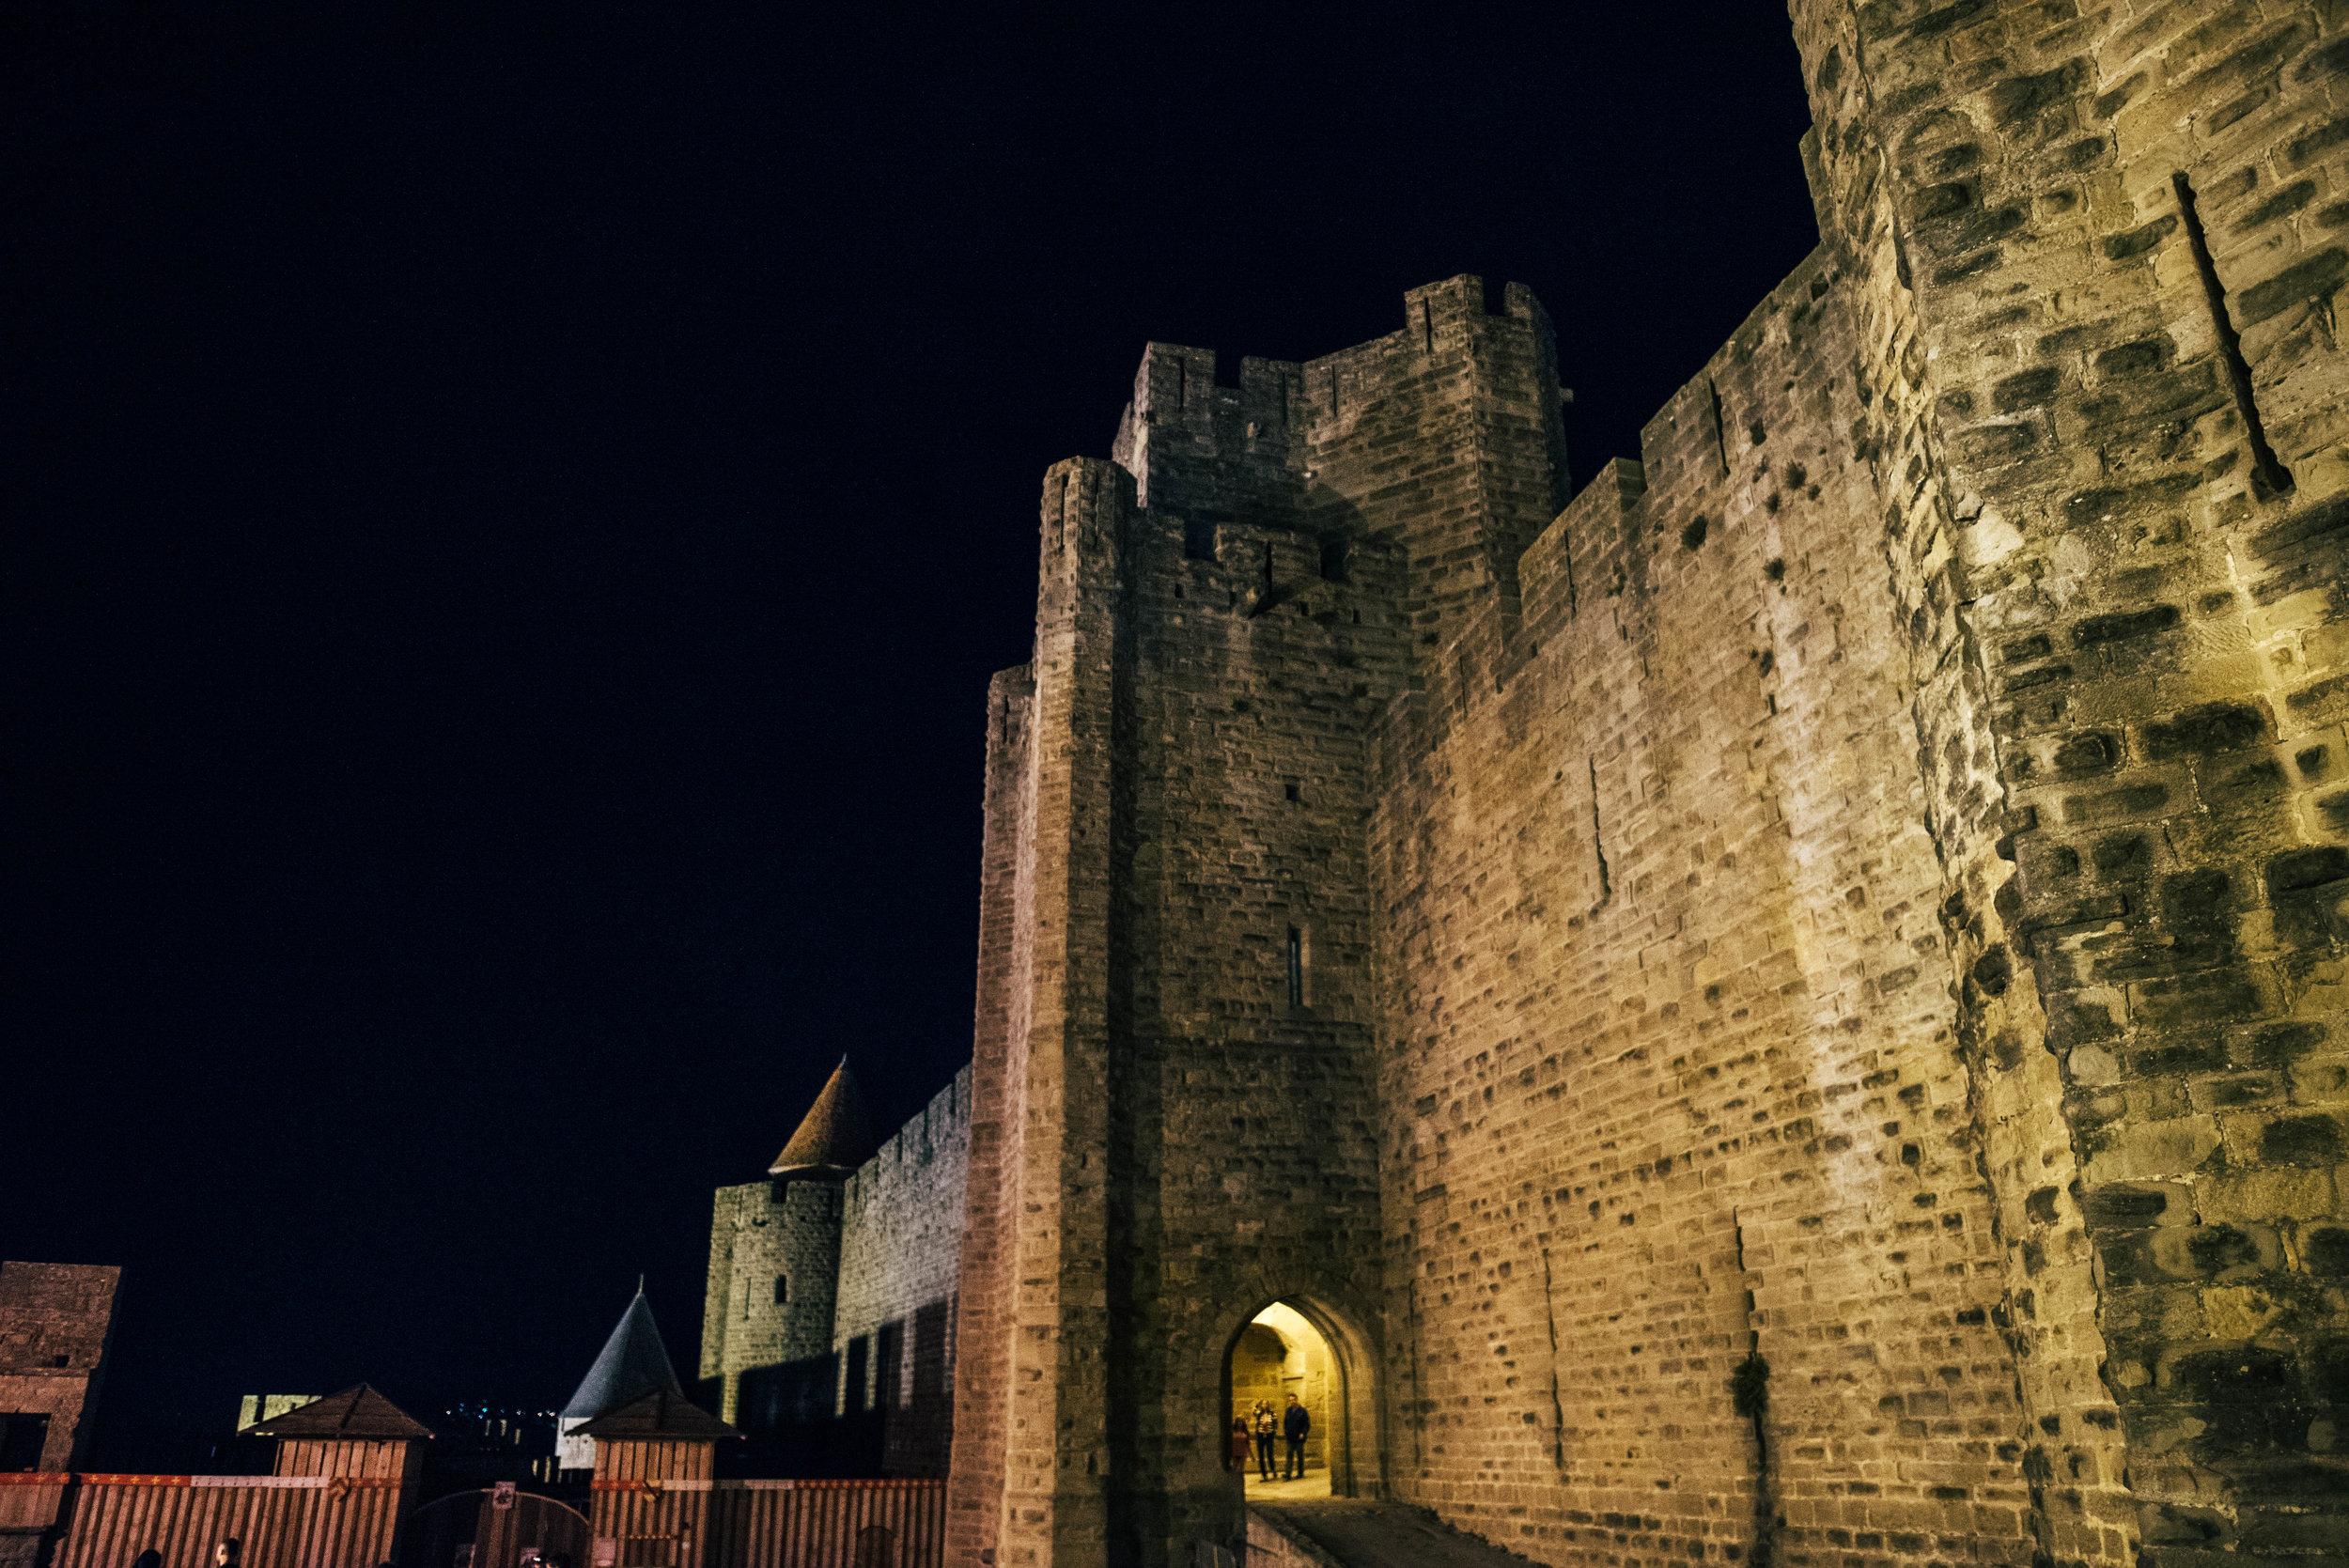 Citadel Carcassonne at night Essex UK Documentary Photographer